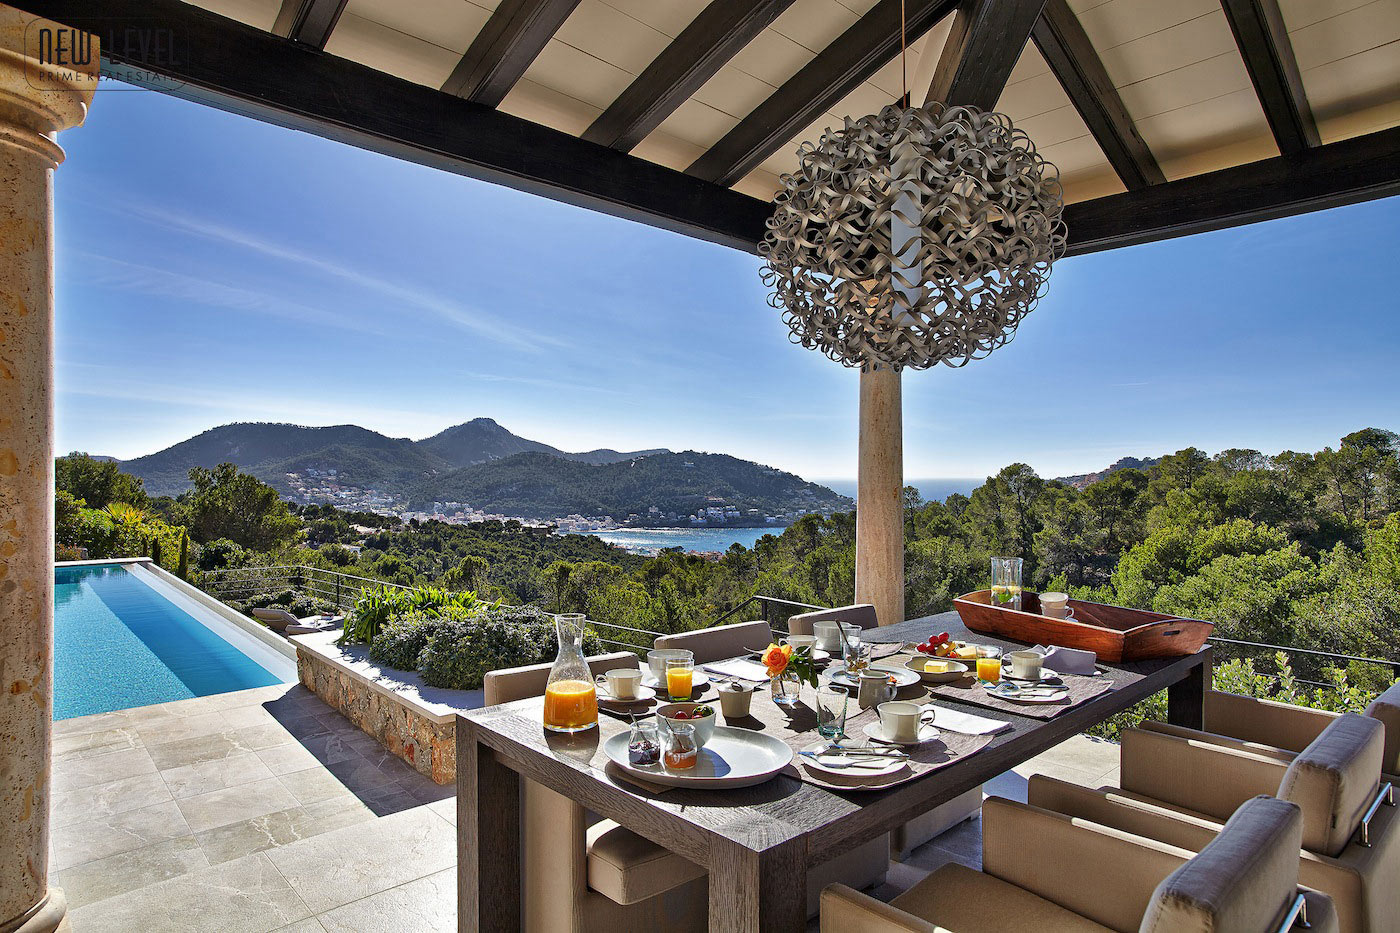 Outdoor Dining, Sea Views, Lighting, Fabulous Villa in Puerto de Andratx, Mallorca